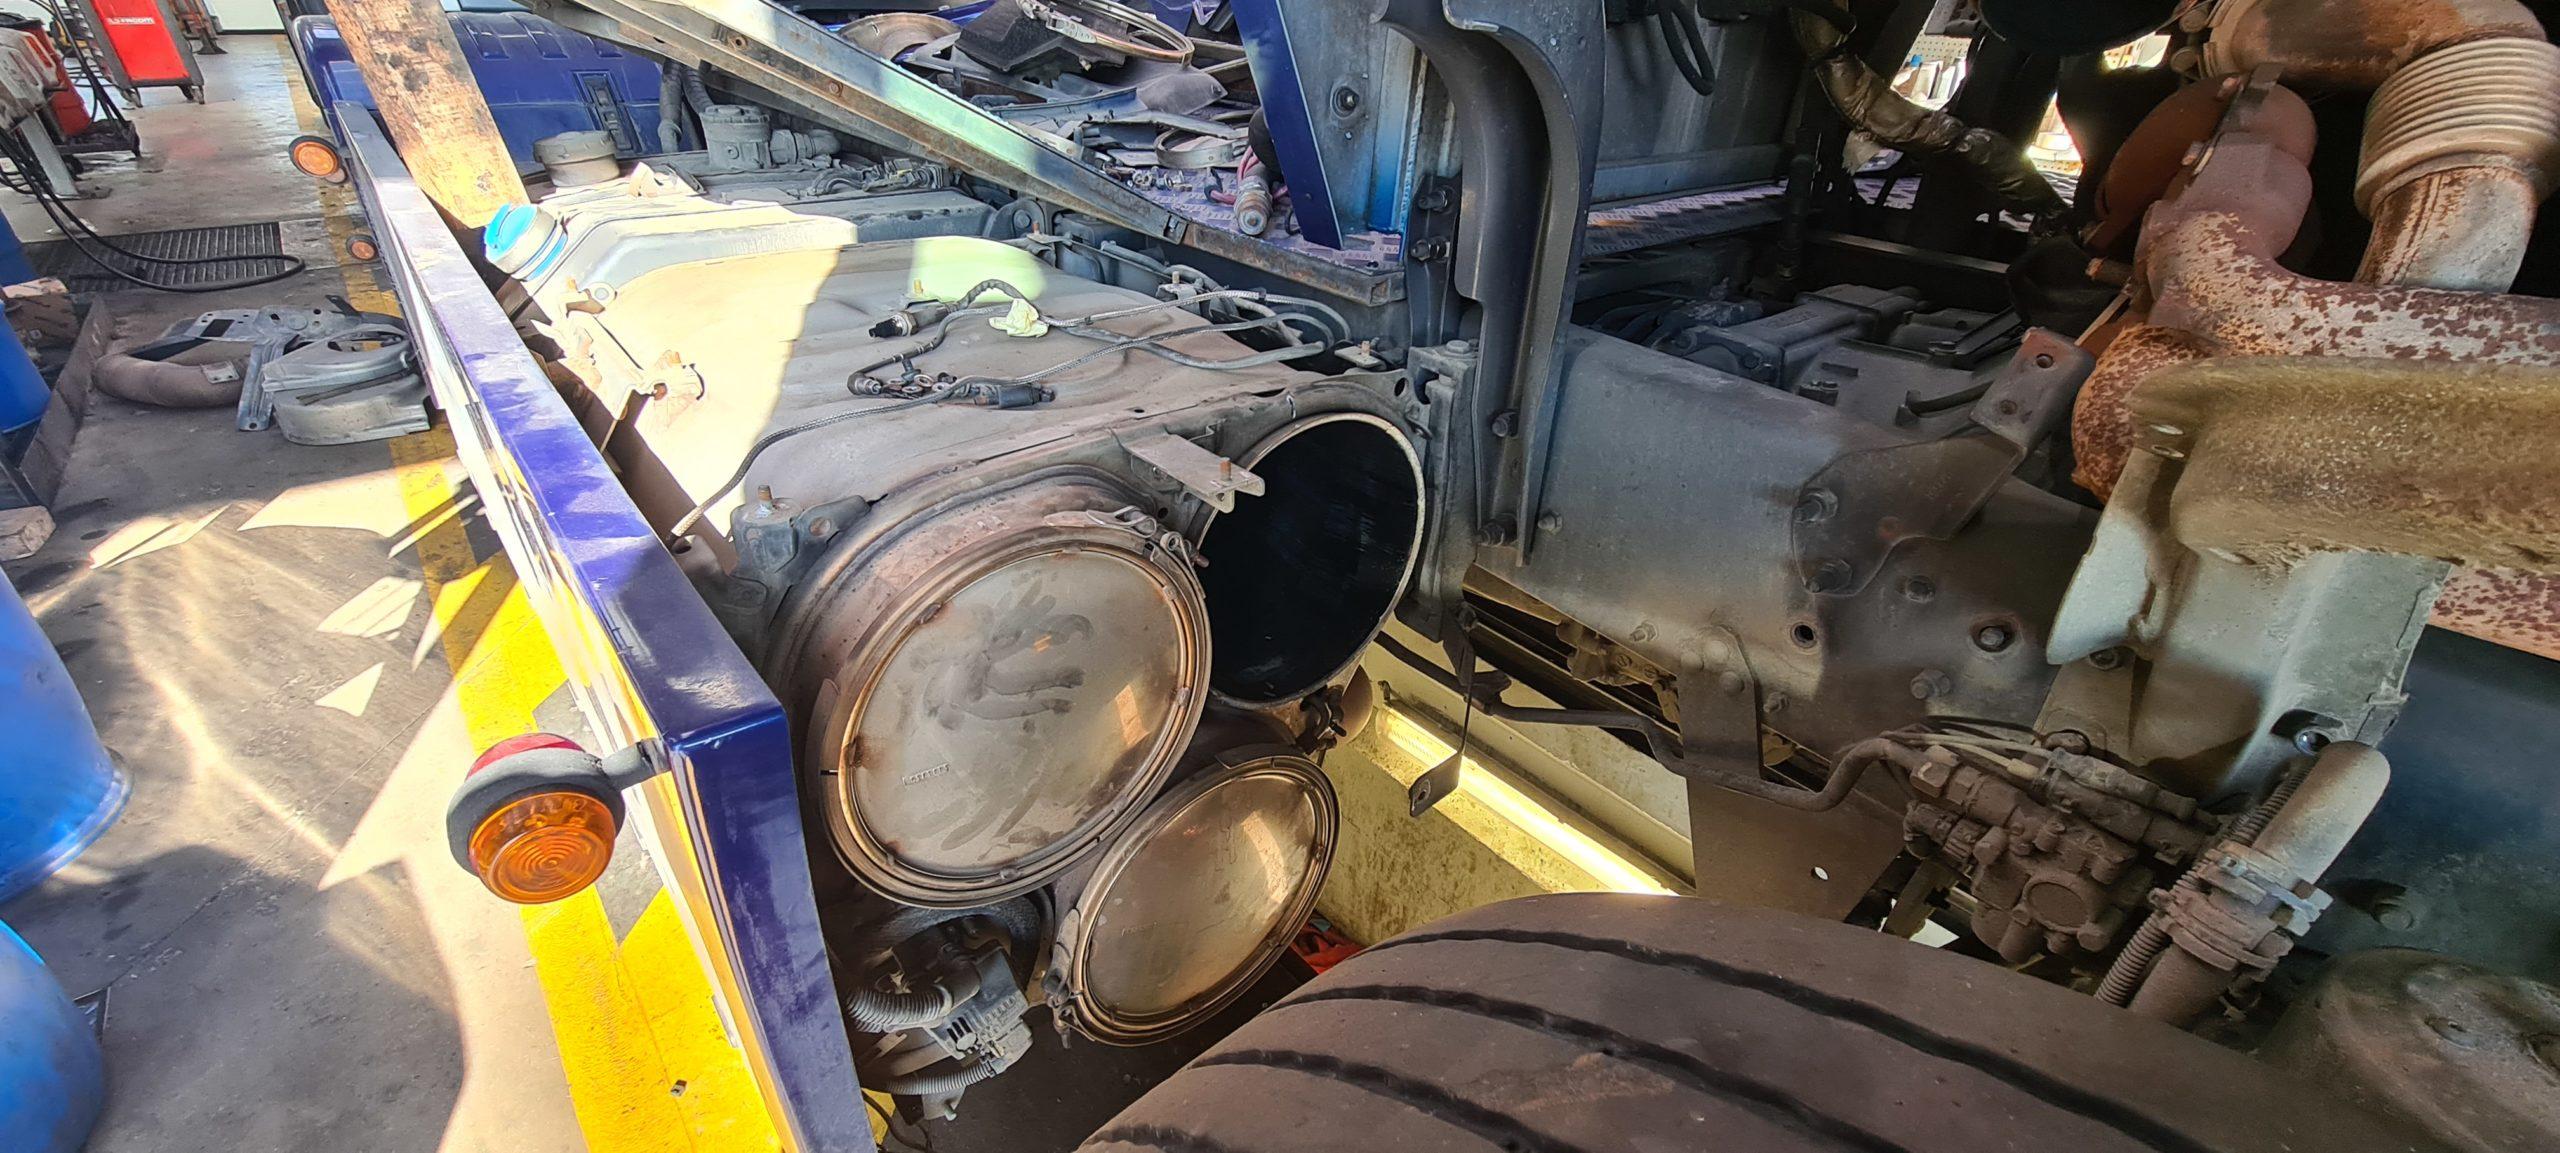 DPF FAP Off Scania Euro 6